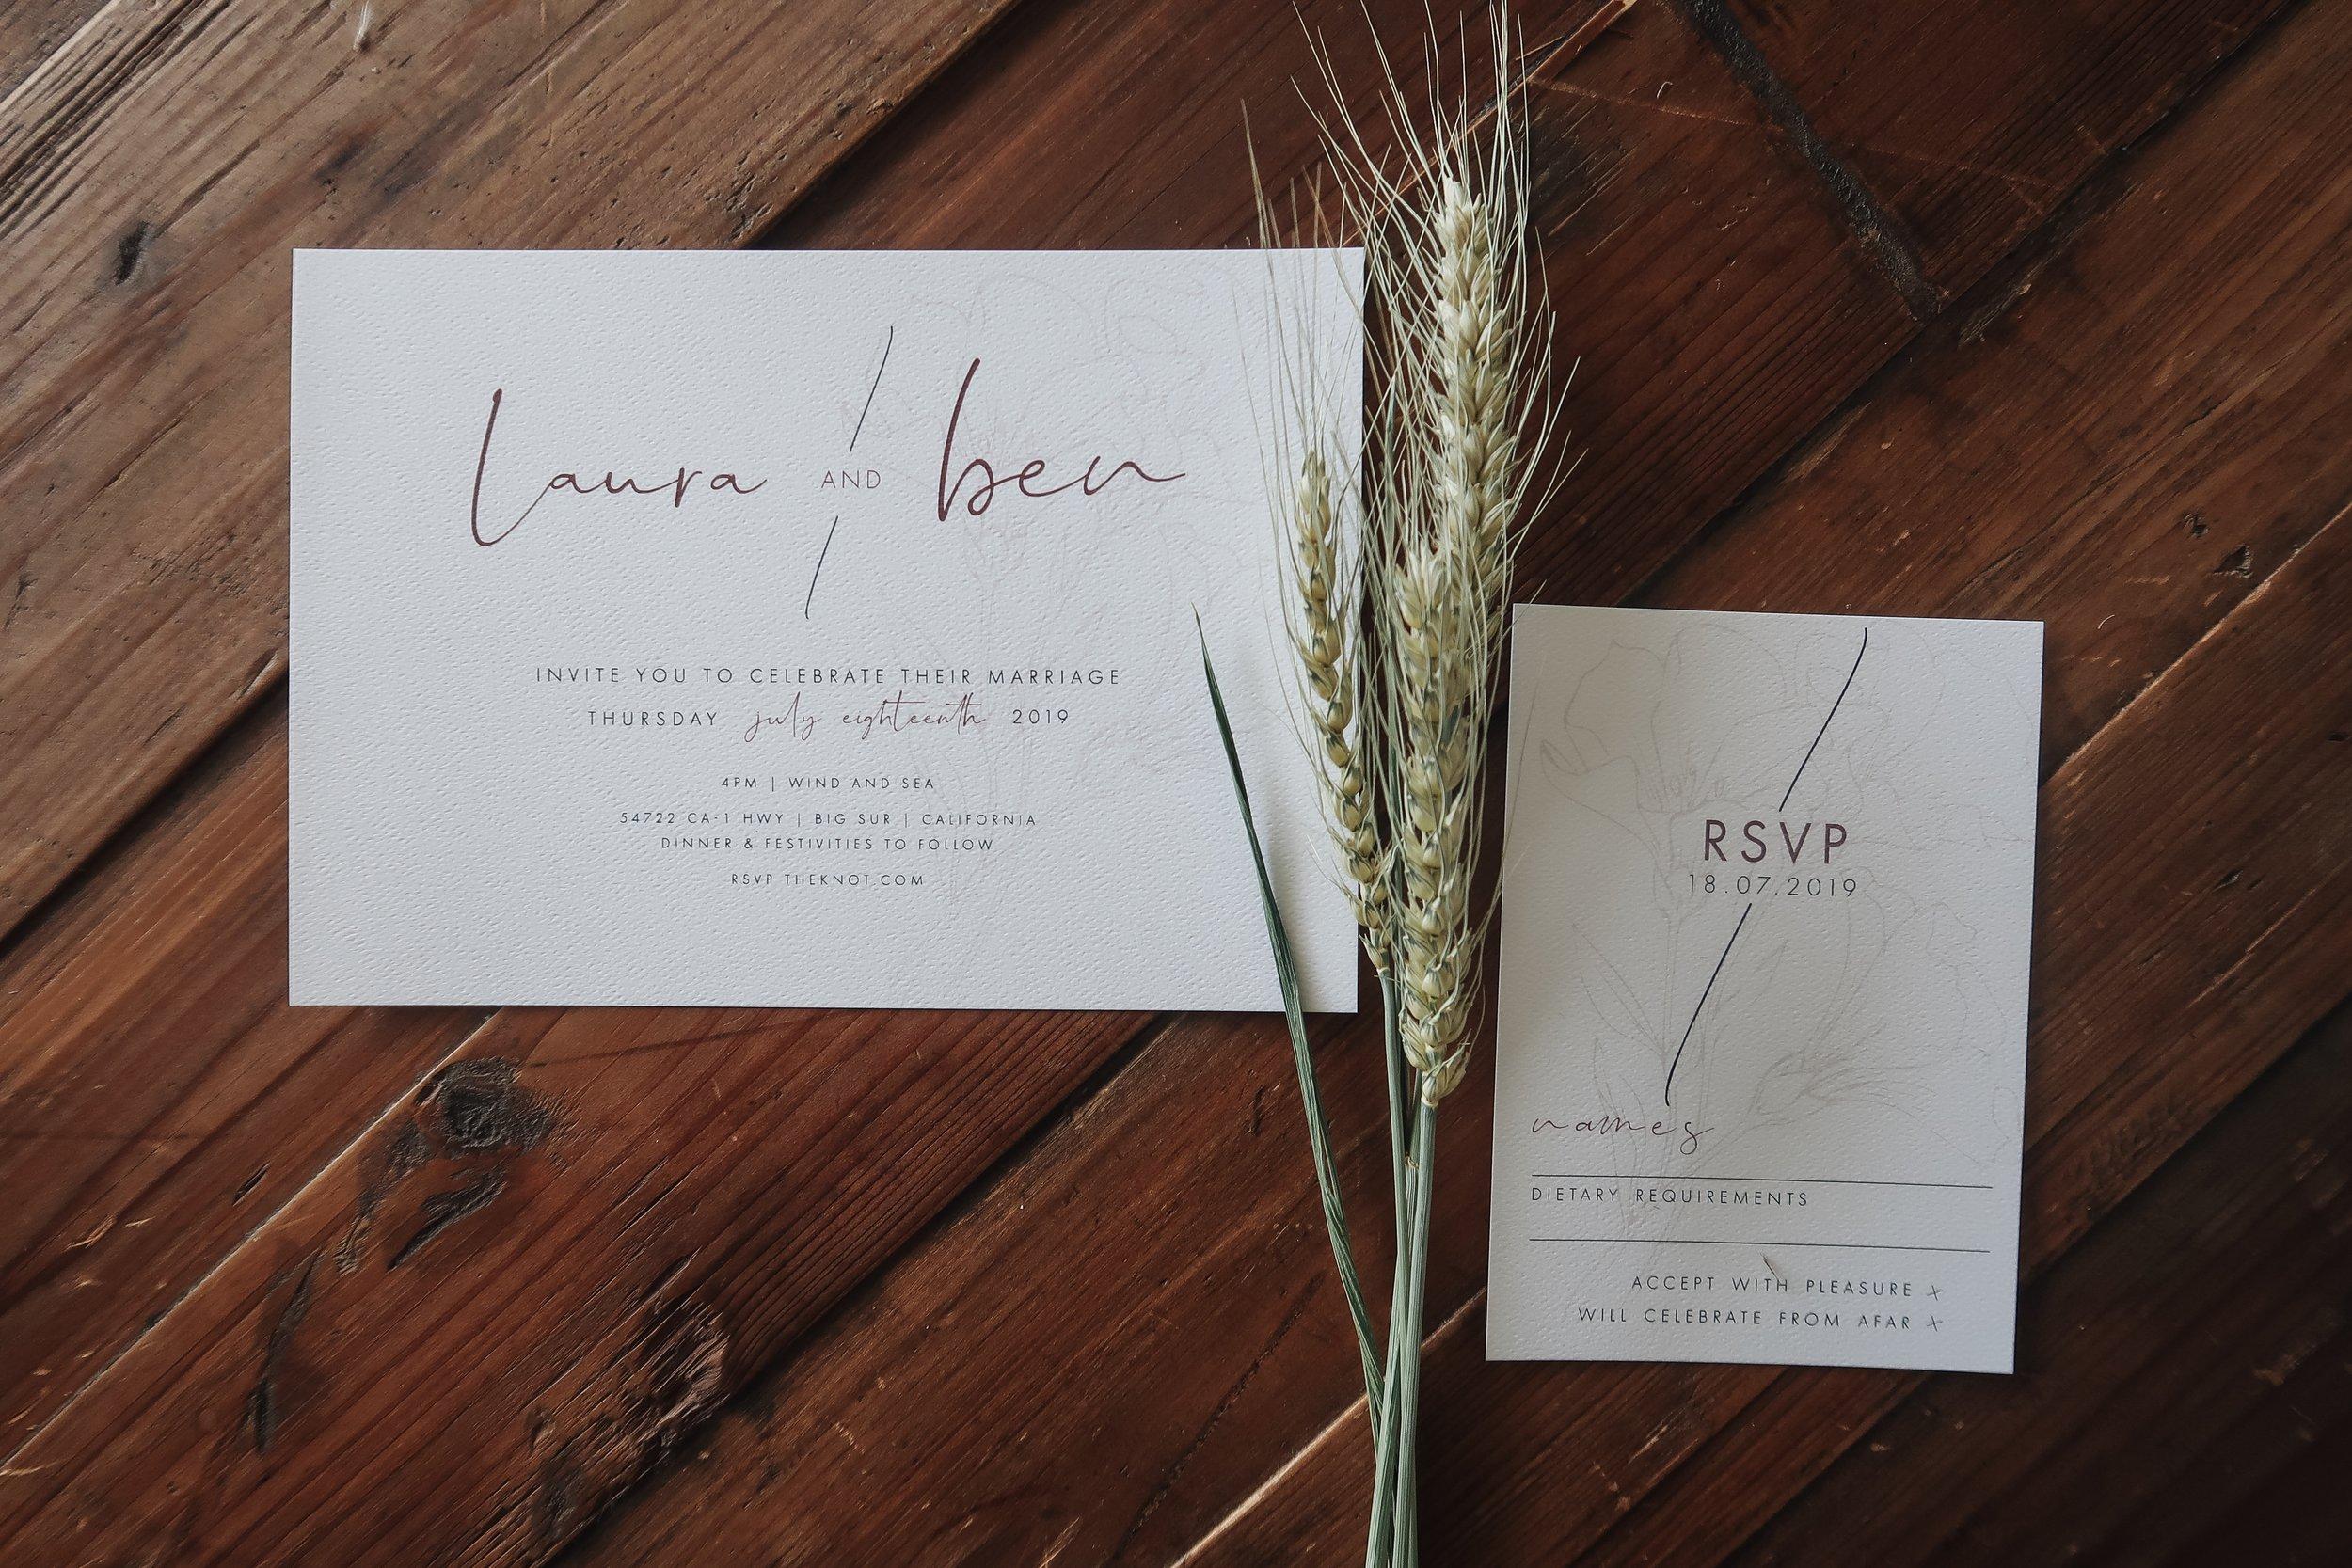 Laura and Ben Invitation + RSVP